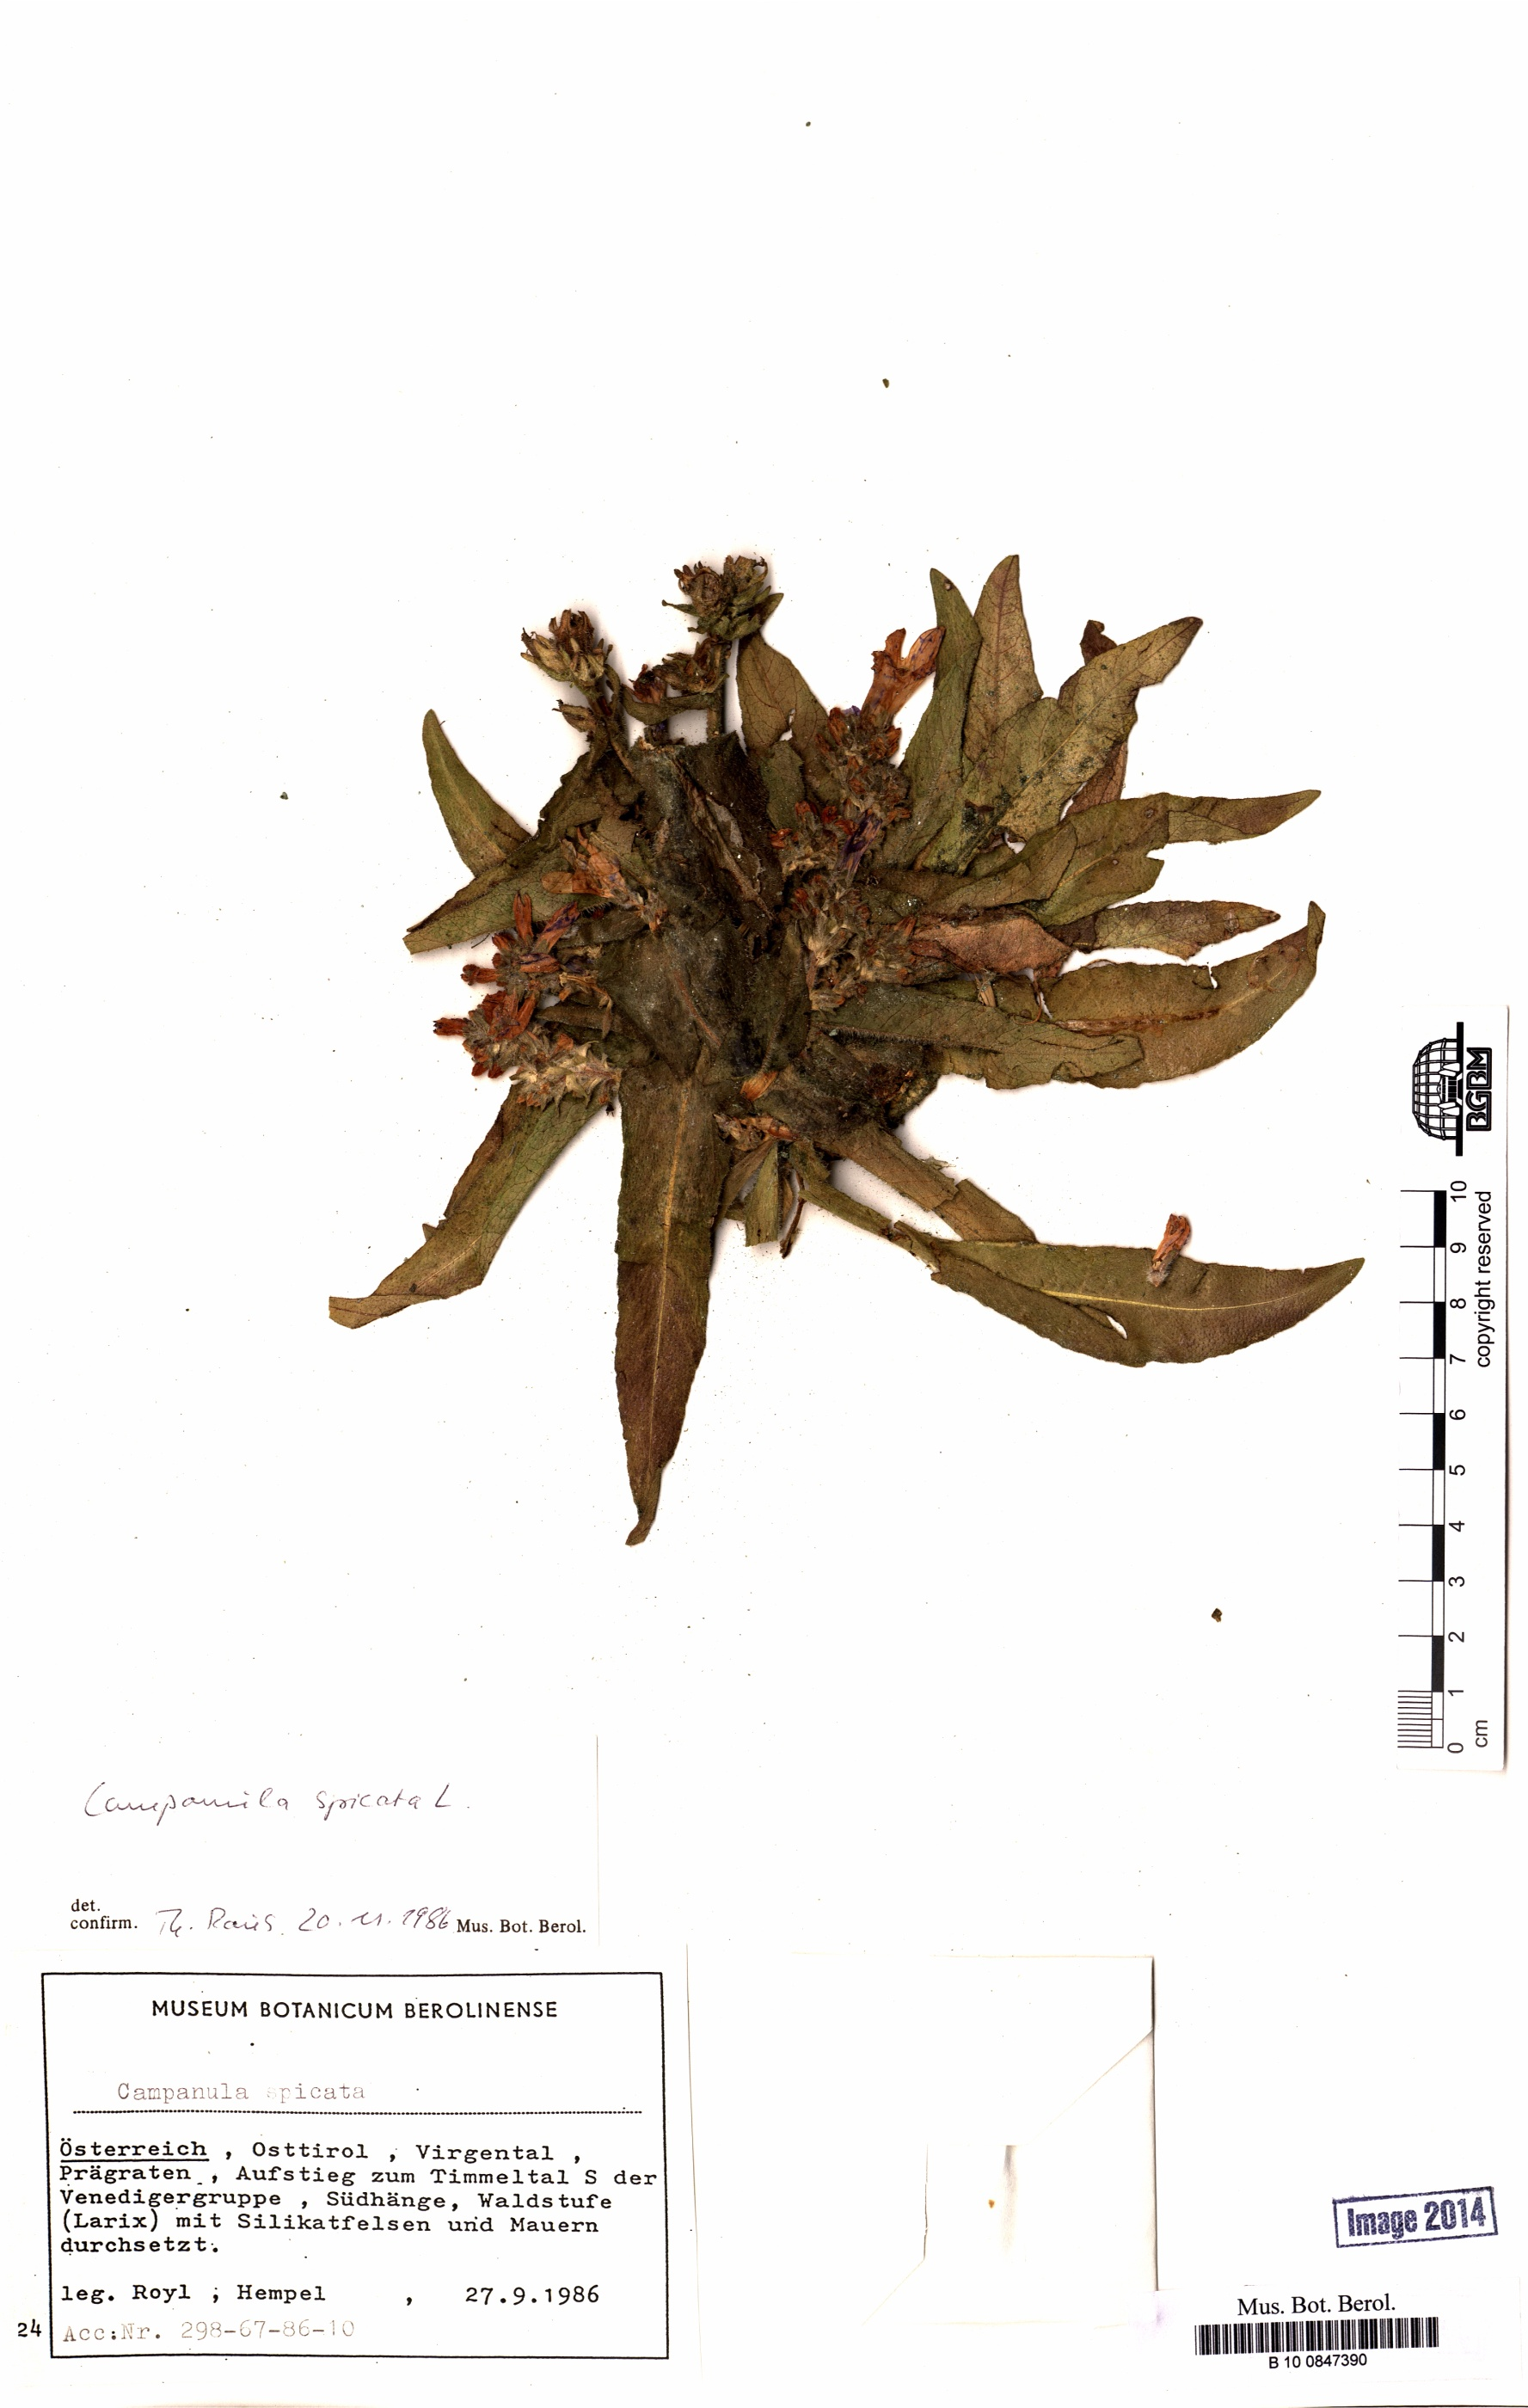 http://ww2.bgbm.org/herbarium/images/B/10/08/47/39/B_10_0847390.jpg